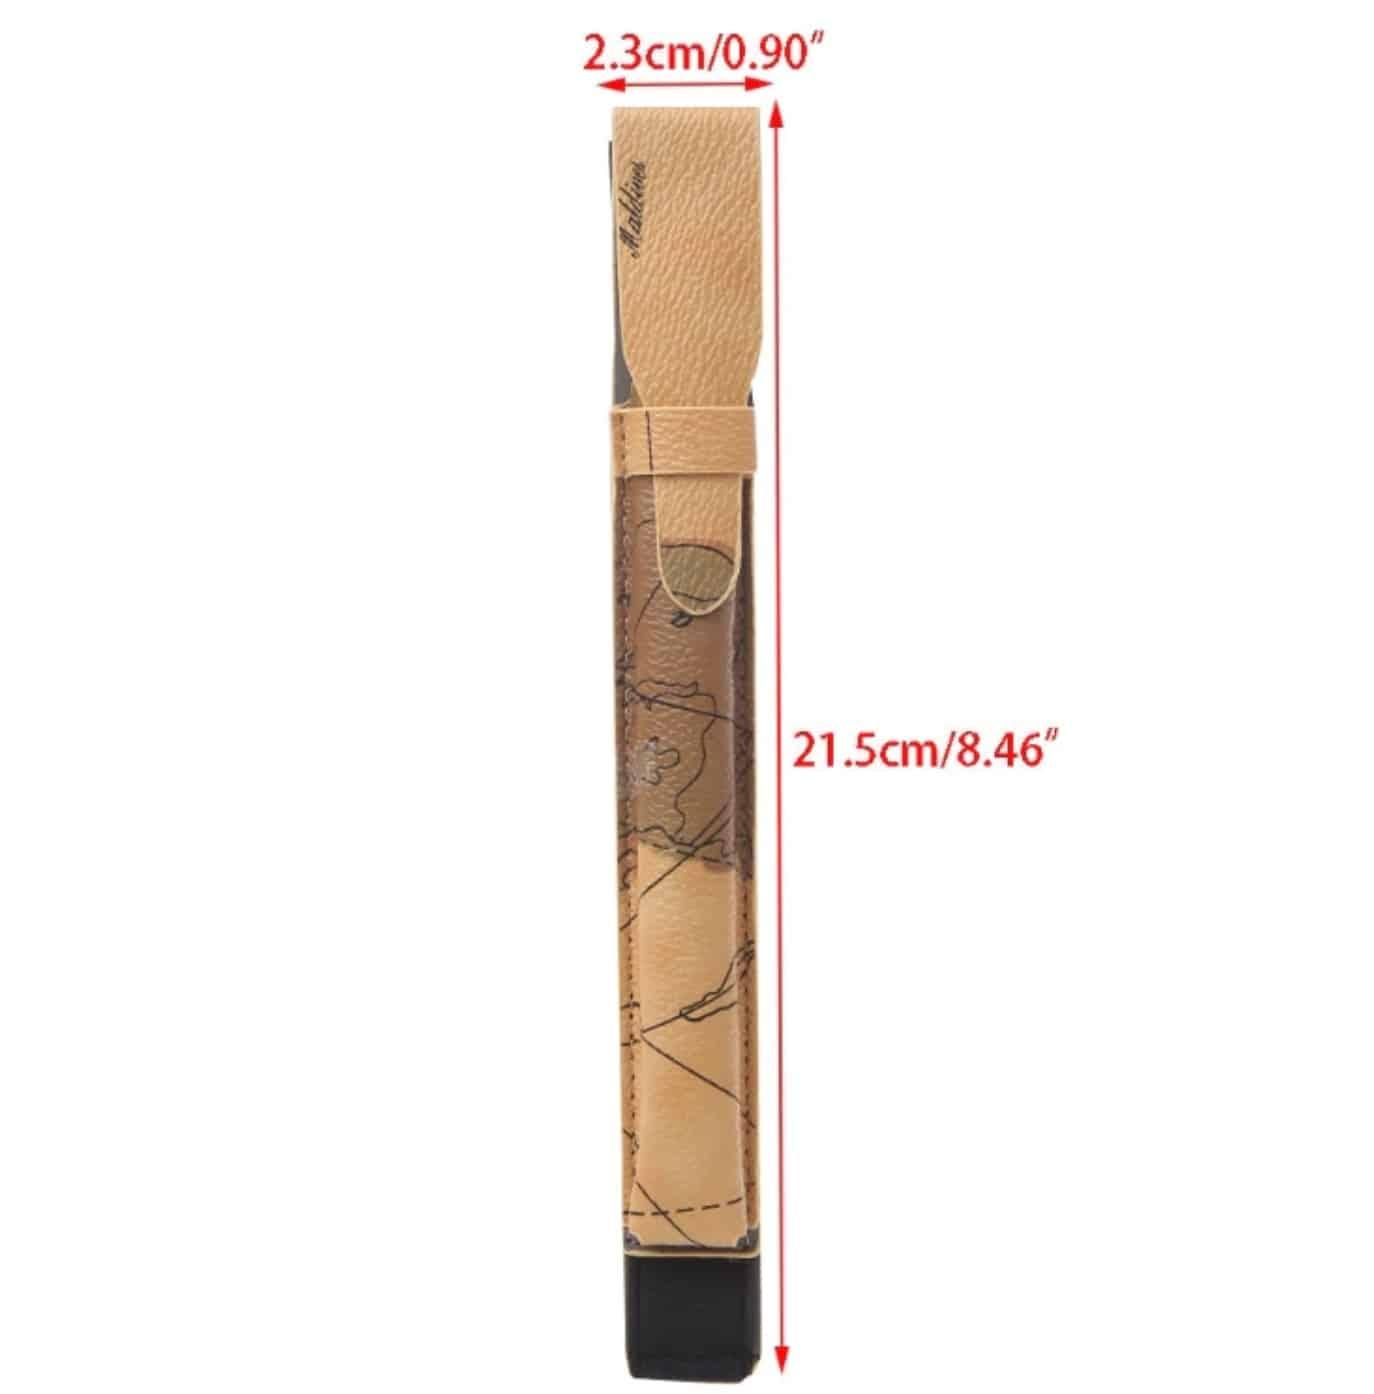 Best Fake Smart pen apple pencil replica Cheap alternative AliExpress Ipad pro Stylus Leather Pouch 6 specifications